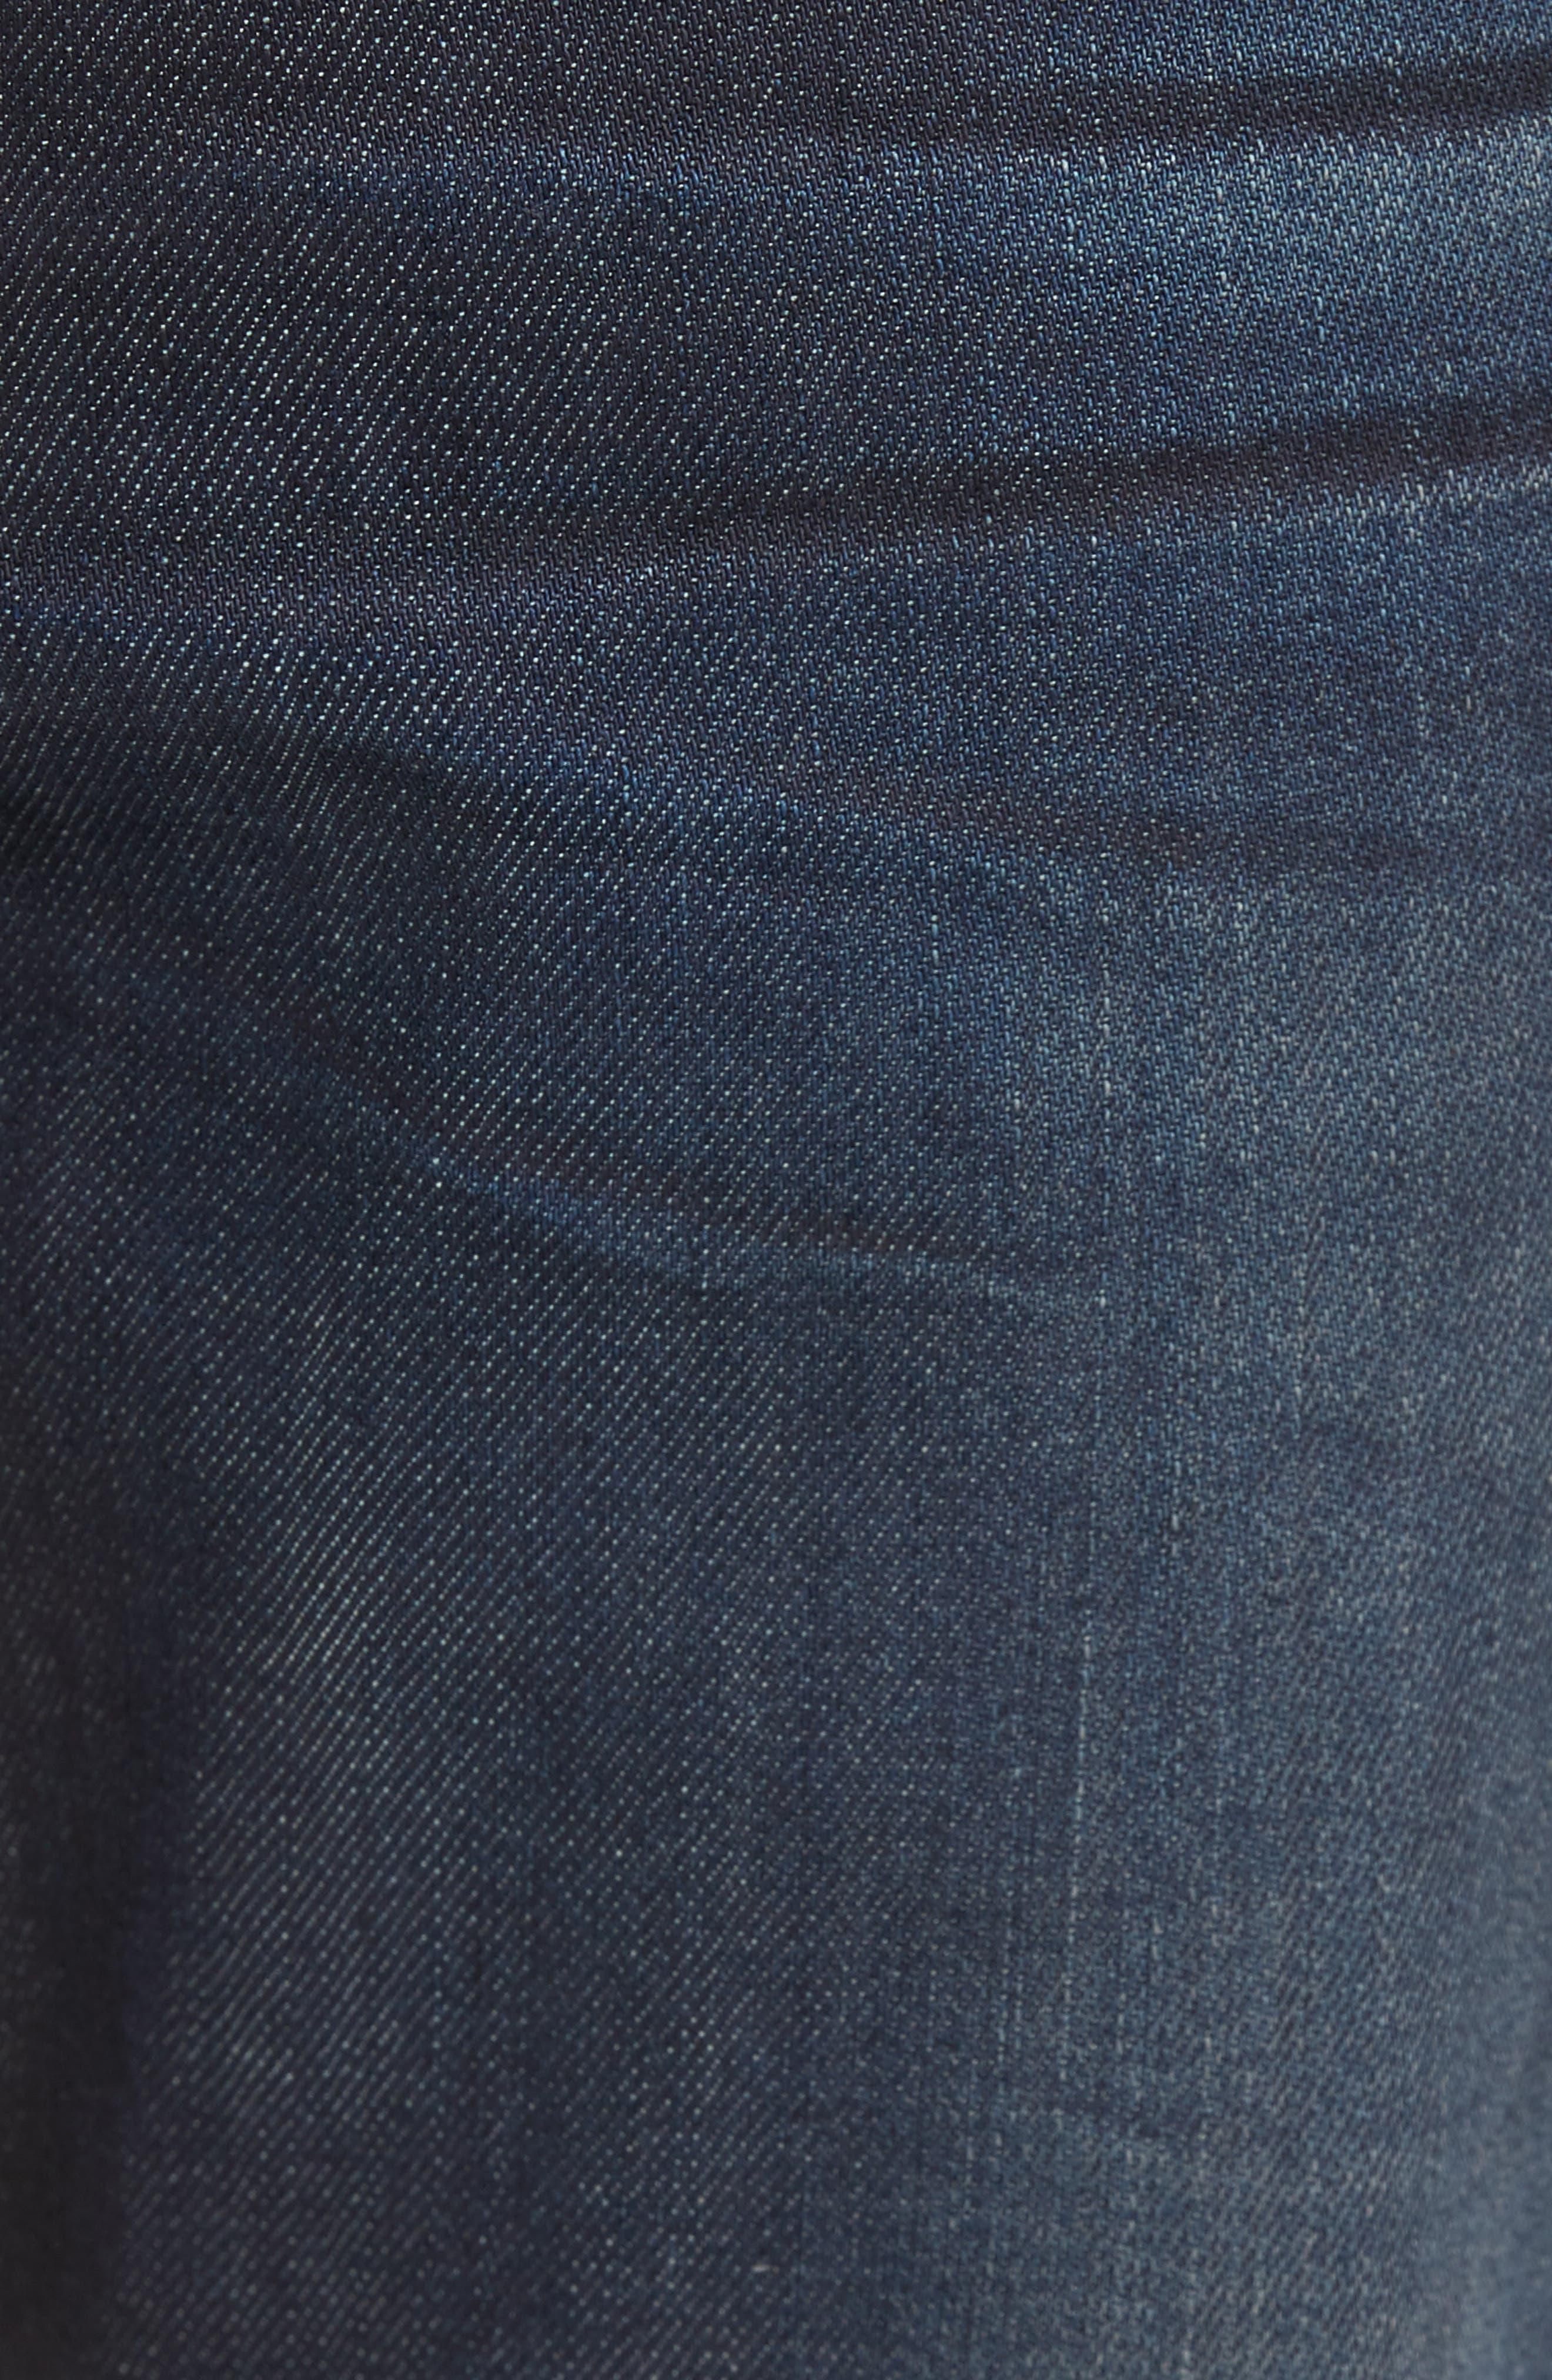 Bowery Slim Fit Jeans,                             Alternate thumbnail 5, color,                             HURON